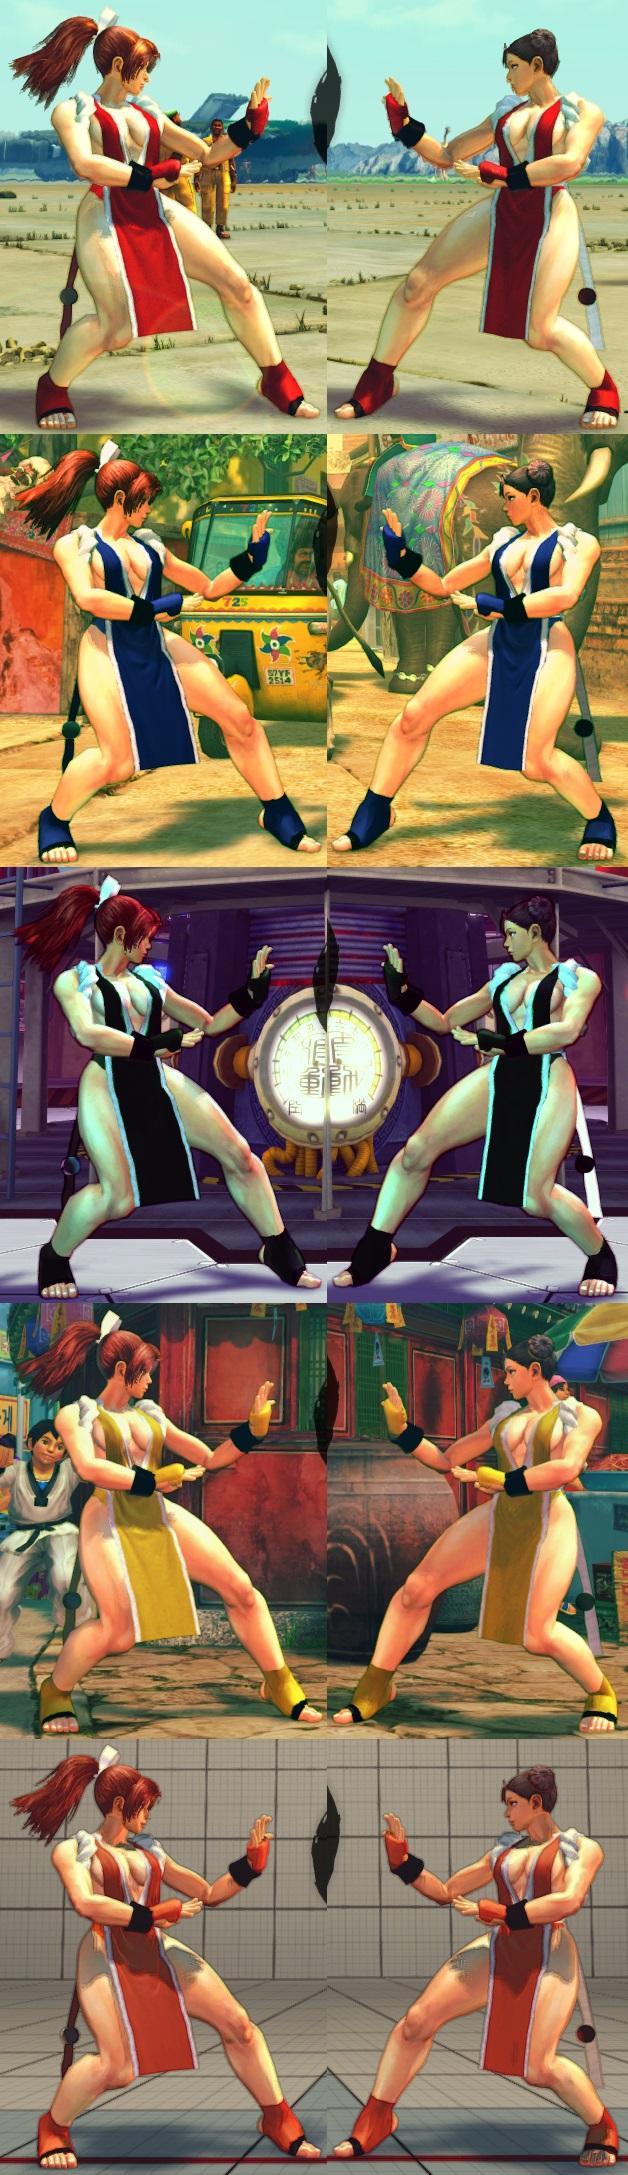 USF4 Mod - Chun Li: Mai Shiranui Cosplay (Socks) by Segadordelinks